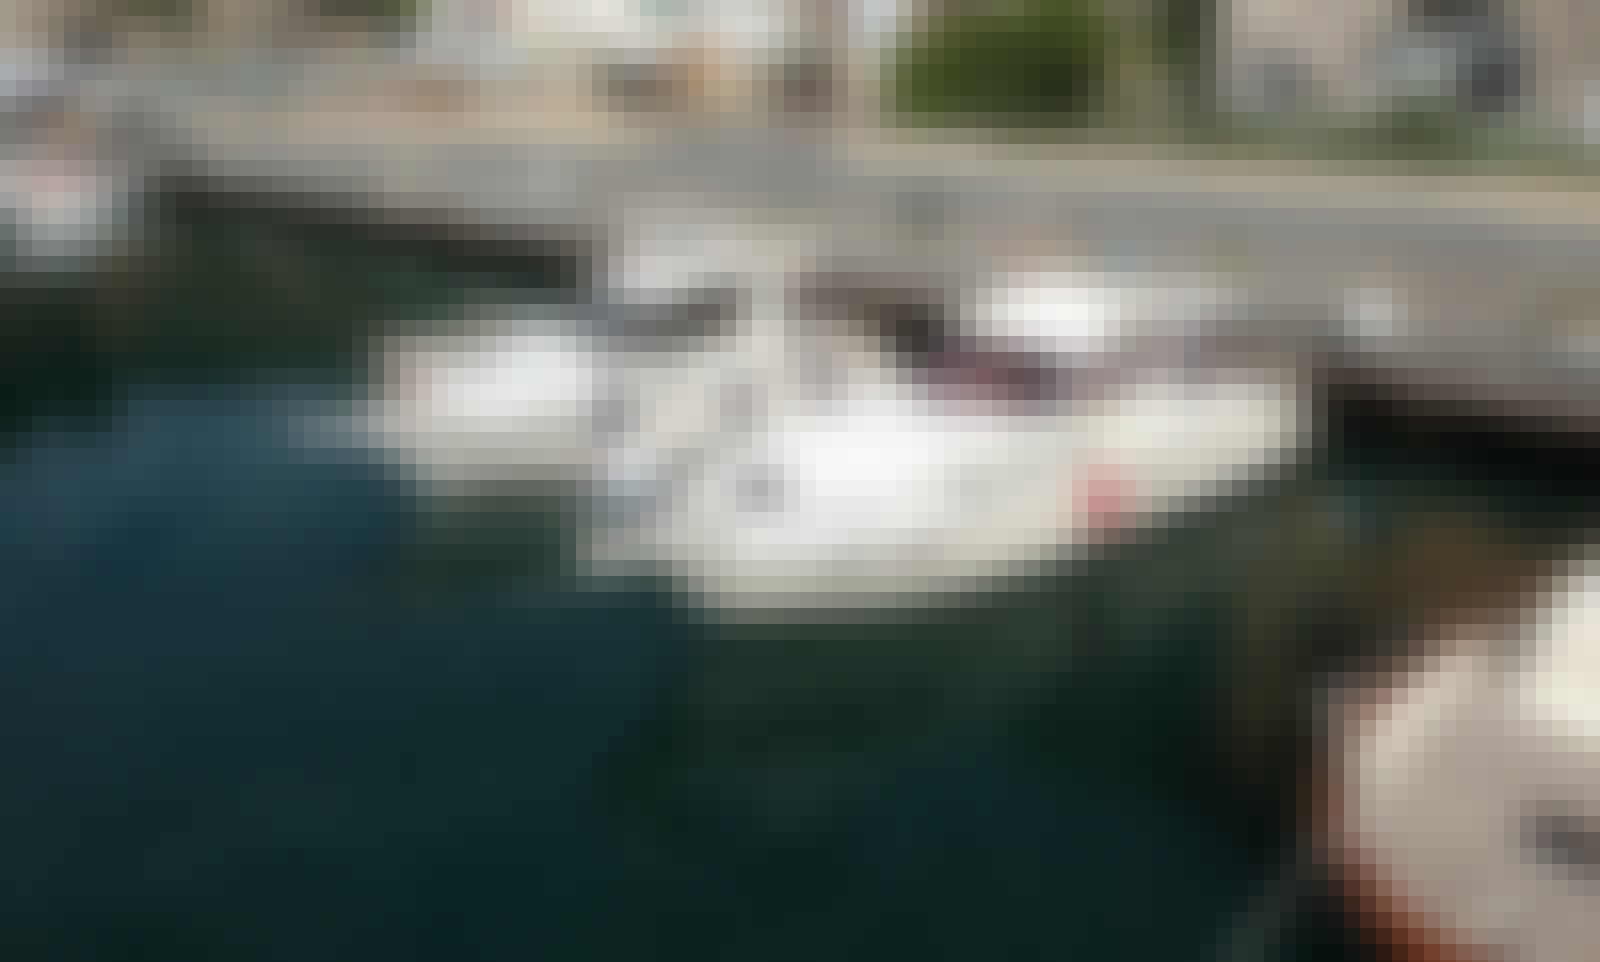 Piano di Sorrento, Italy Boat Tour Aboard a 480 hp Raffaelli Motor Yacht for 12 People